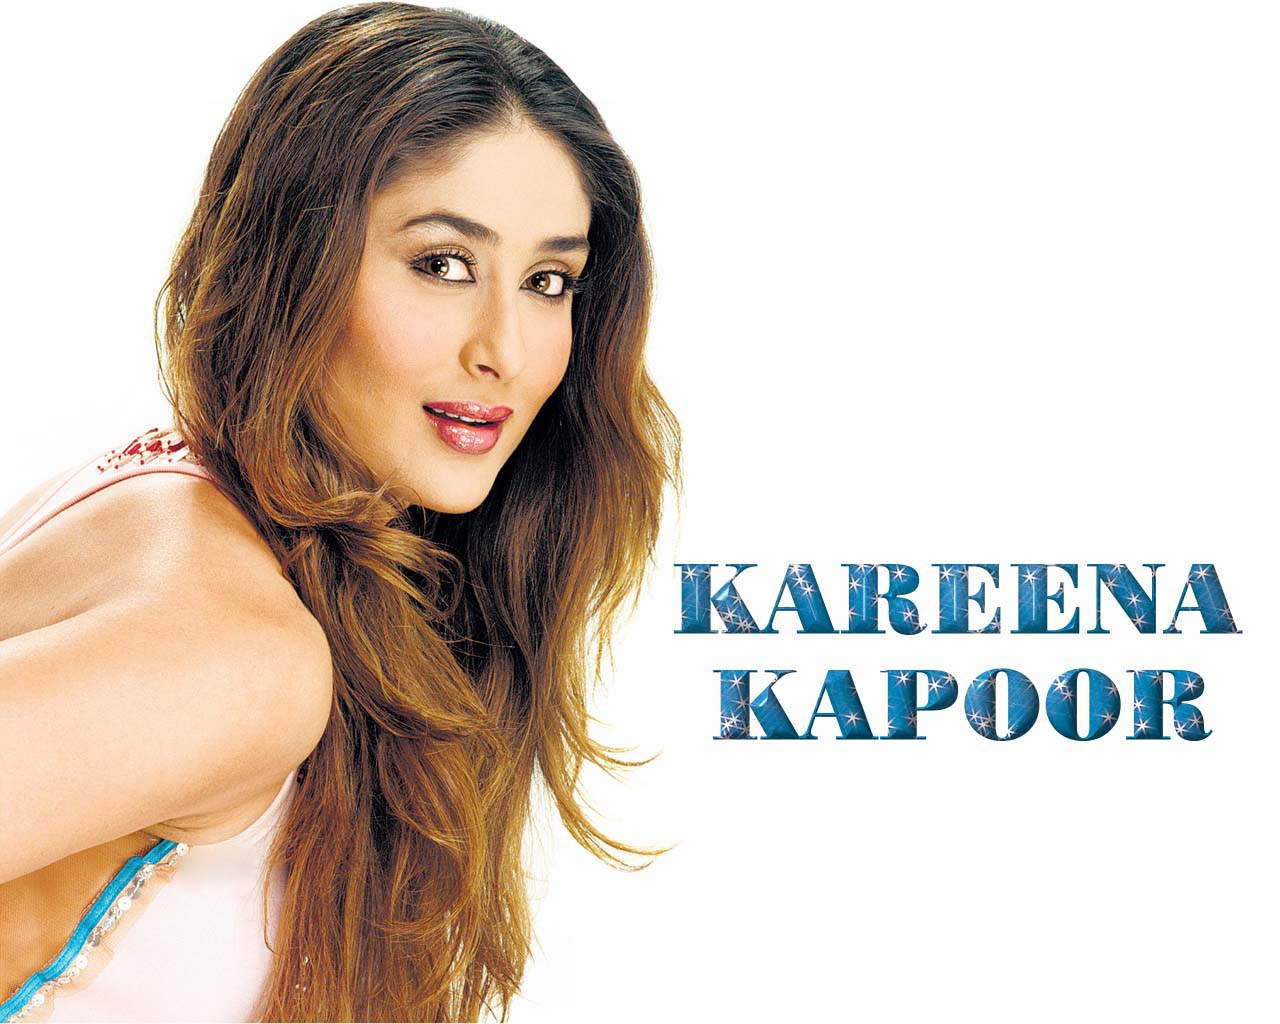 http://2.bp.blogspot.com/-WWARbJv6SJI/UMcHQ1SqWmI/AAAAAAAAFs8/uz8qO2iWe0Y/s1600/Kareena-Kapoor-Wallpapers-2012+05.jpg